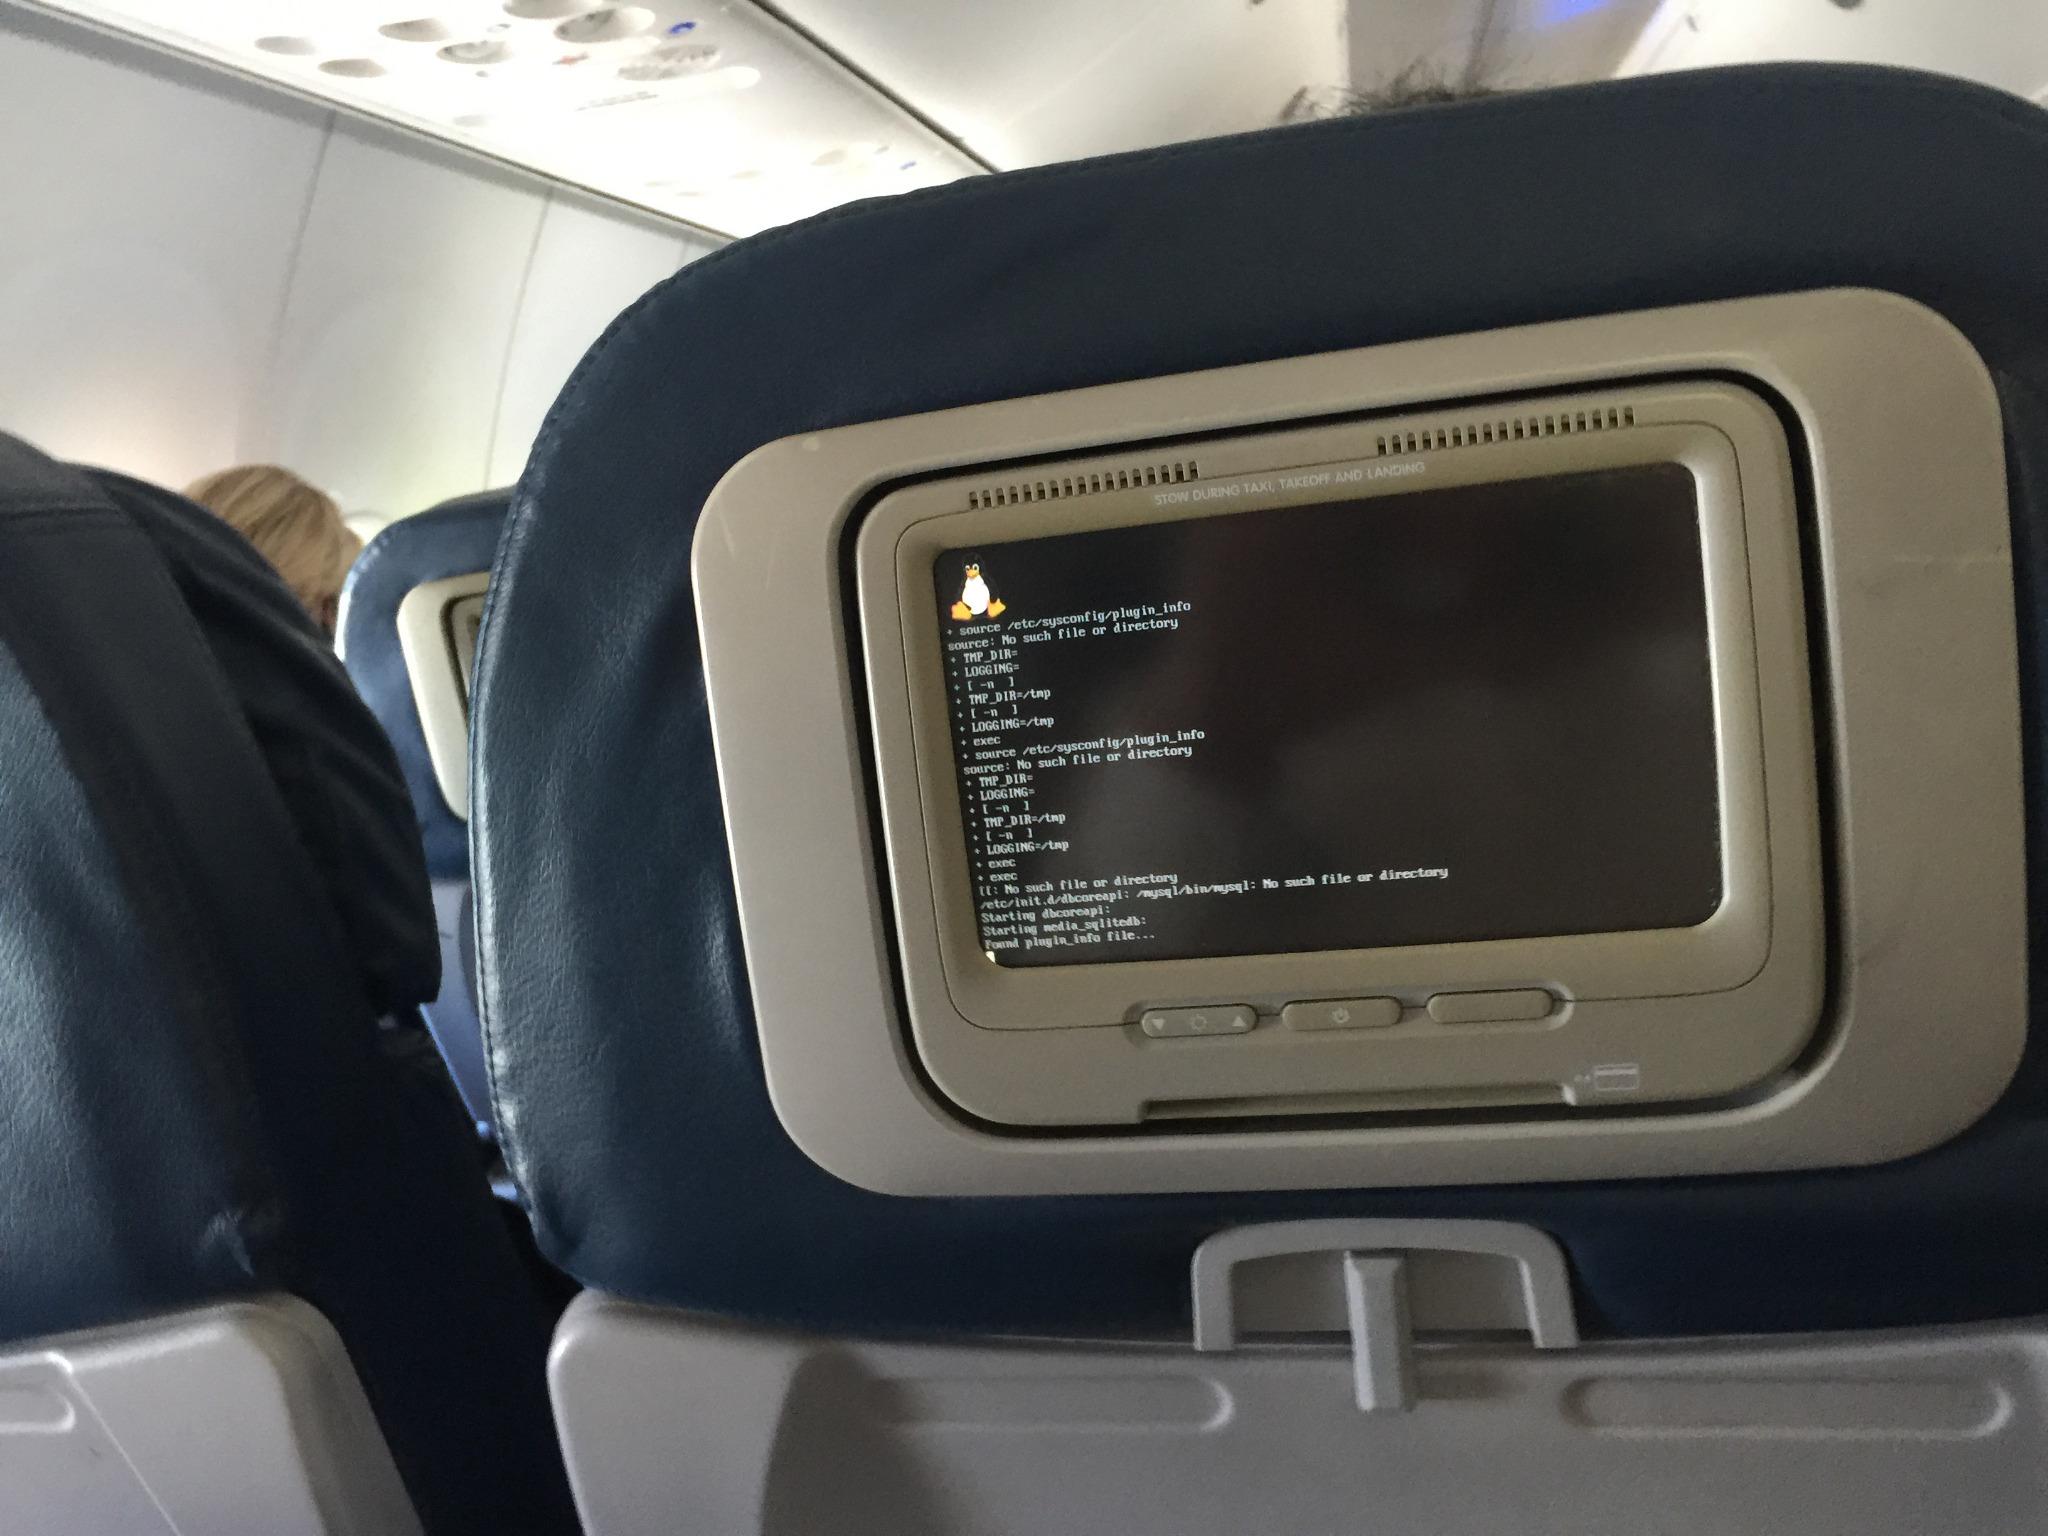 In_flight_system_Linux_bootup.jpg